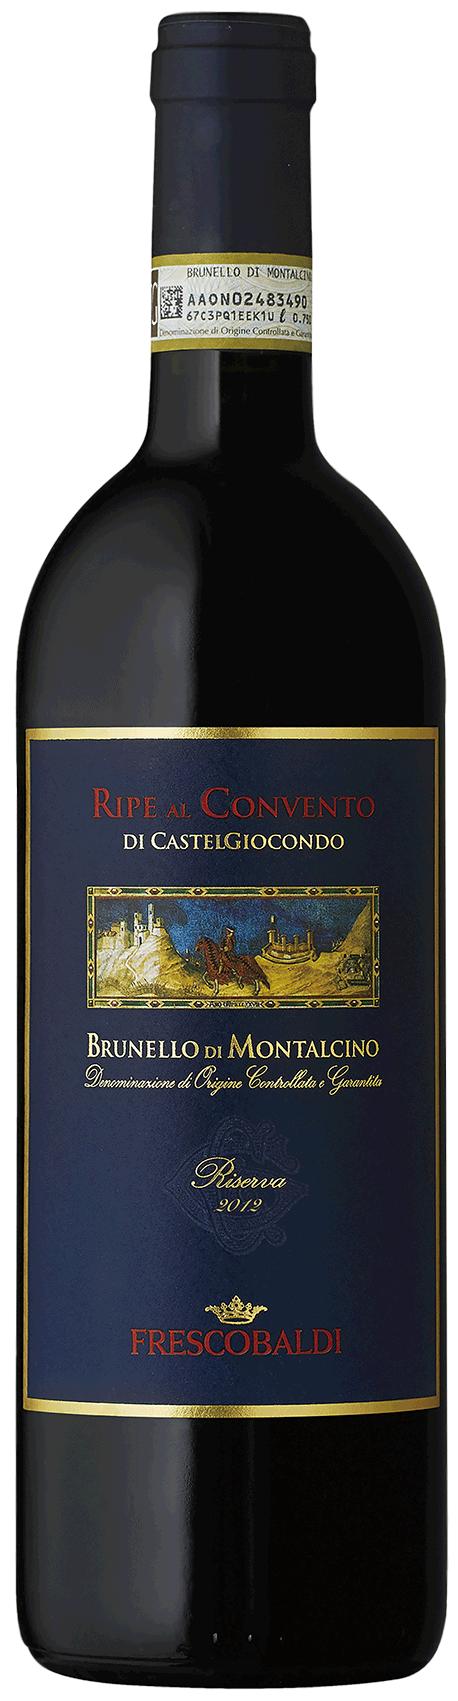 Ripe al Convento Brunello di Montalcino Riserva ブルネッロ・ディ・モンタルチーノ・カステルジョコンド・リゼルヴァ